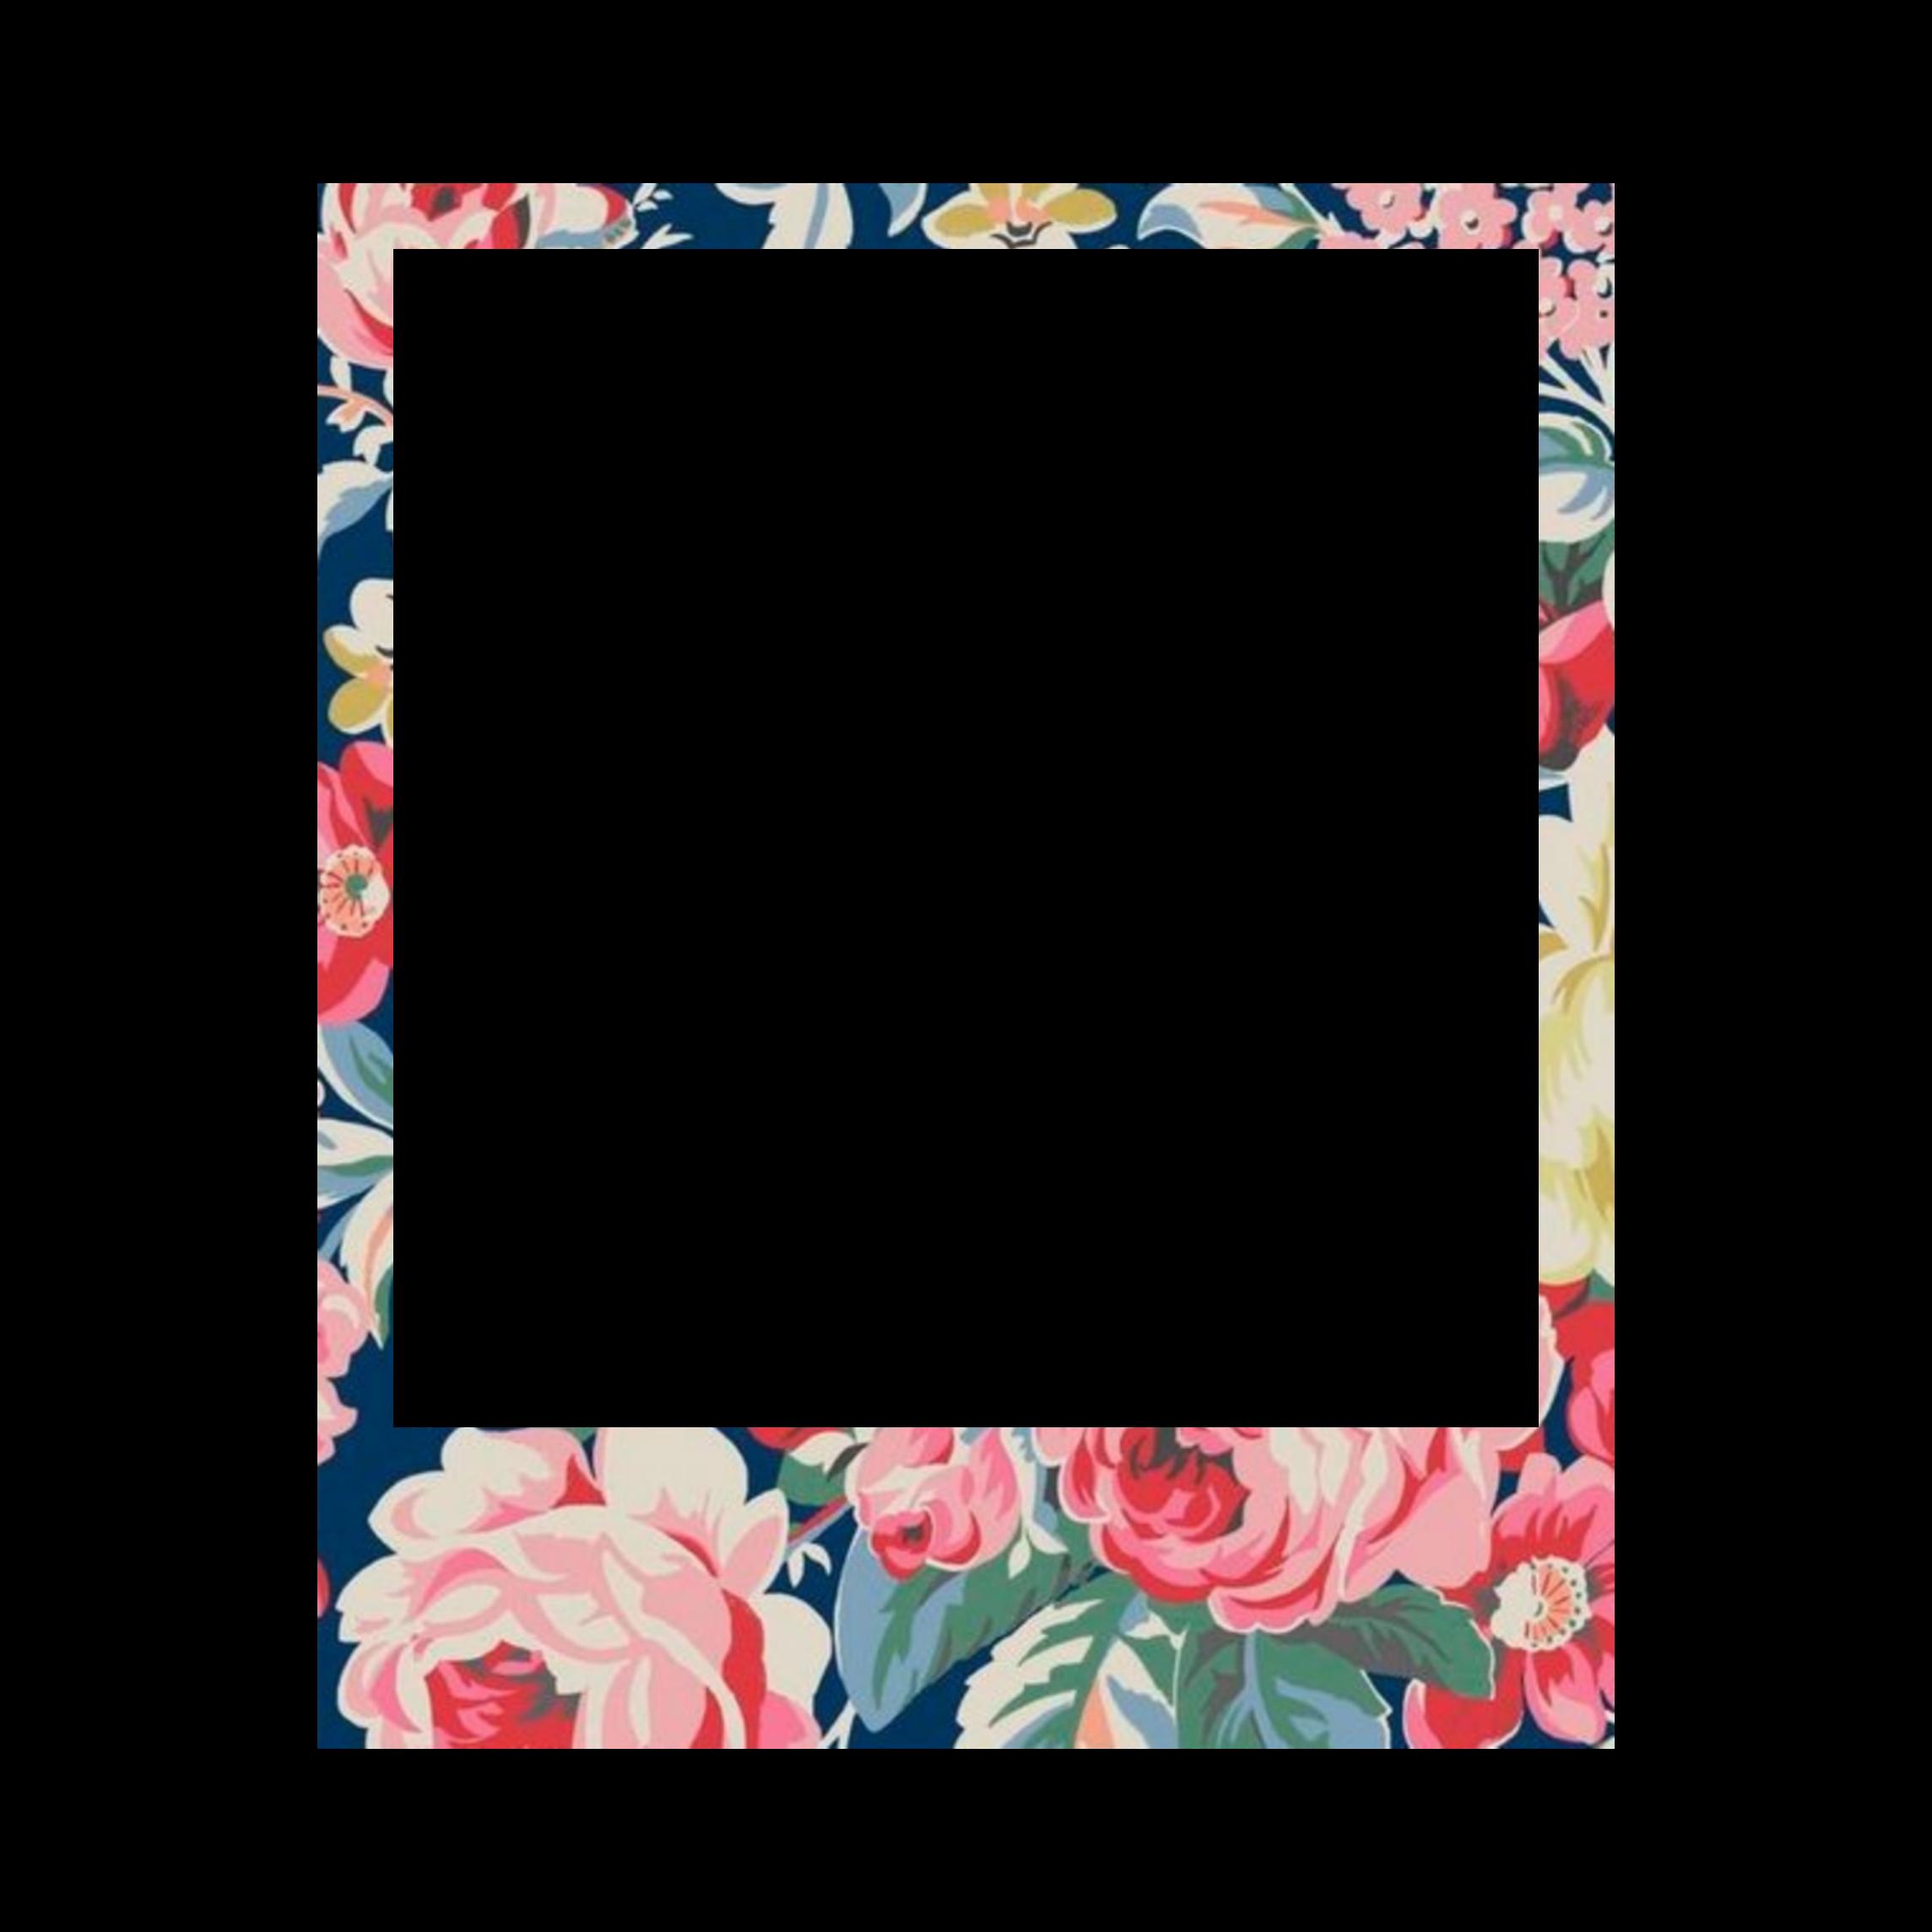 Freetoedit Frames Frame Love Flower Flowers Cute Aesthetic Vintage Tumblr Pink In 2020 Instagram Frame Template Instagram Photo Frame Polaroid Picture Frame